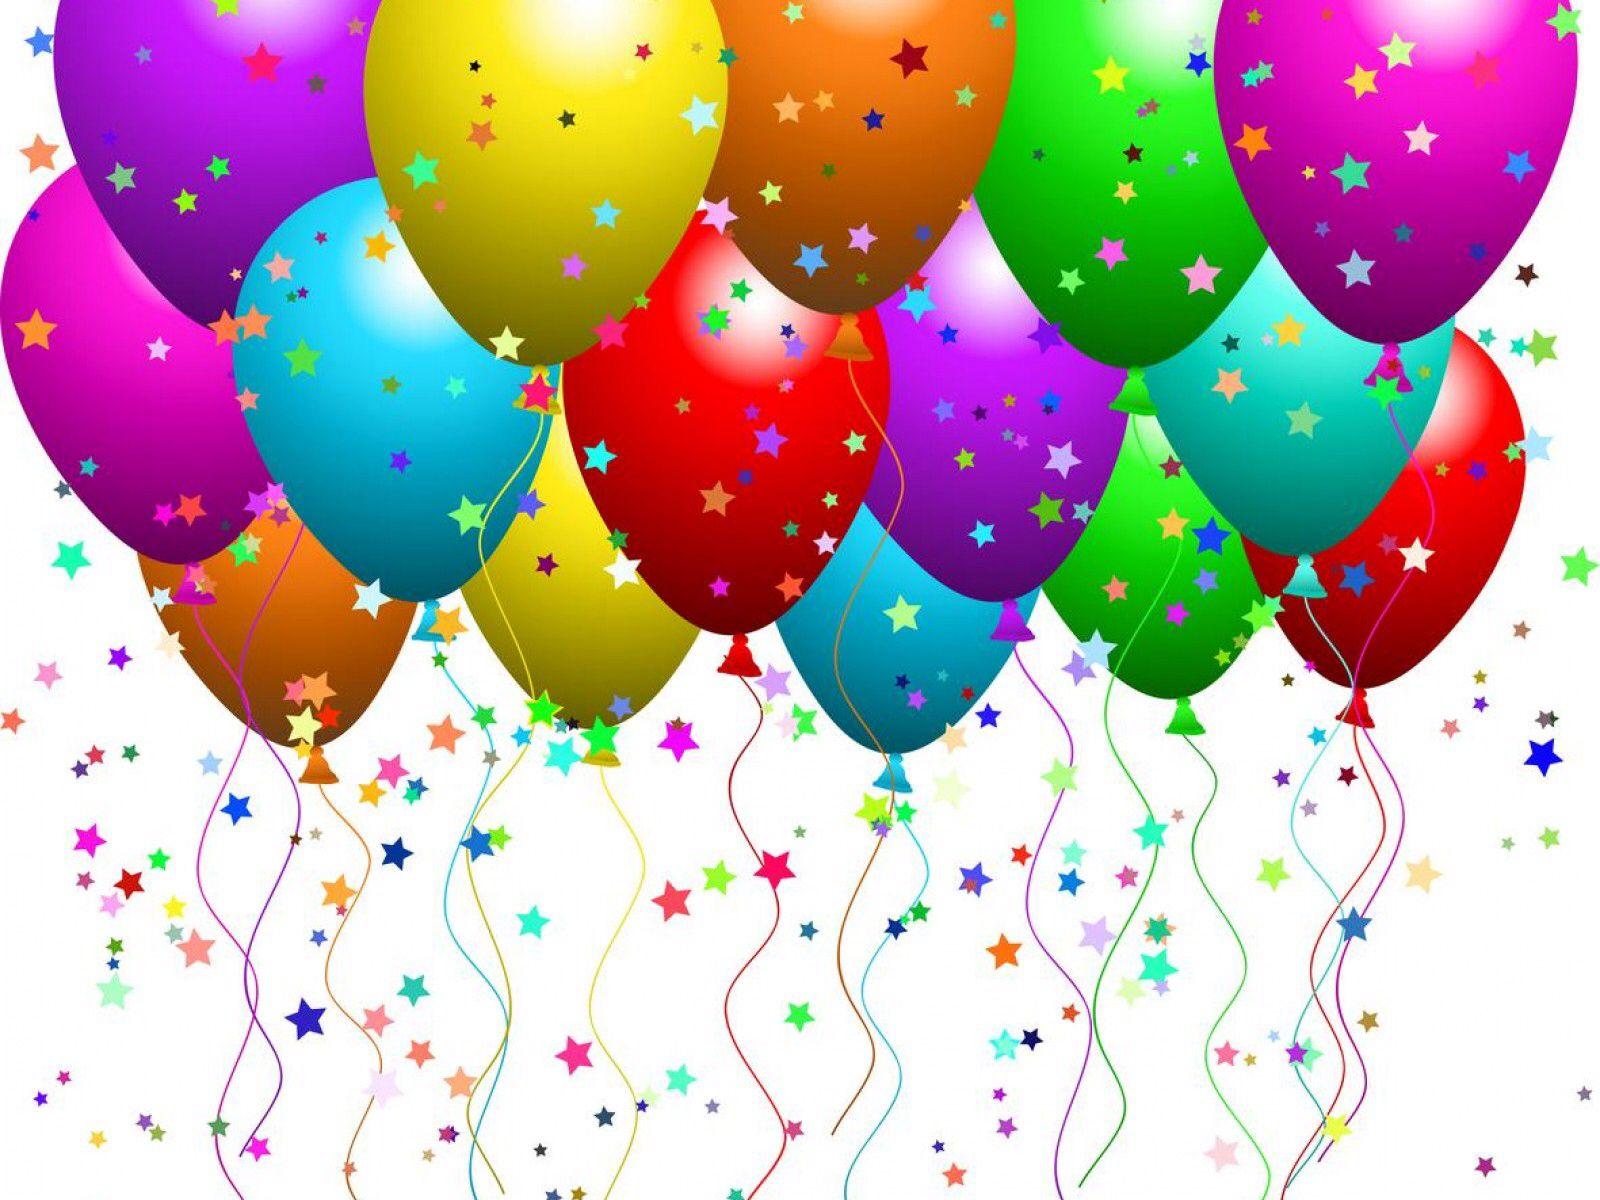 Imagen de http://www.nocturnar.com/forum/attachments/perfiles/92013d1360884457-cumpleanos-feliz-cumplea-os-wallpaper-10-cumplea-os-feliz-cumplea-os-happy-birthday-1600x1200.jpg.